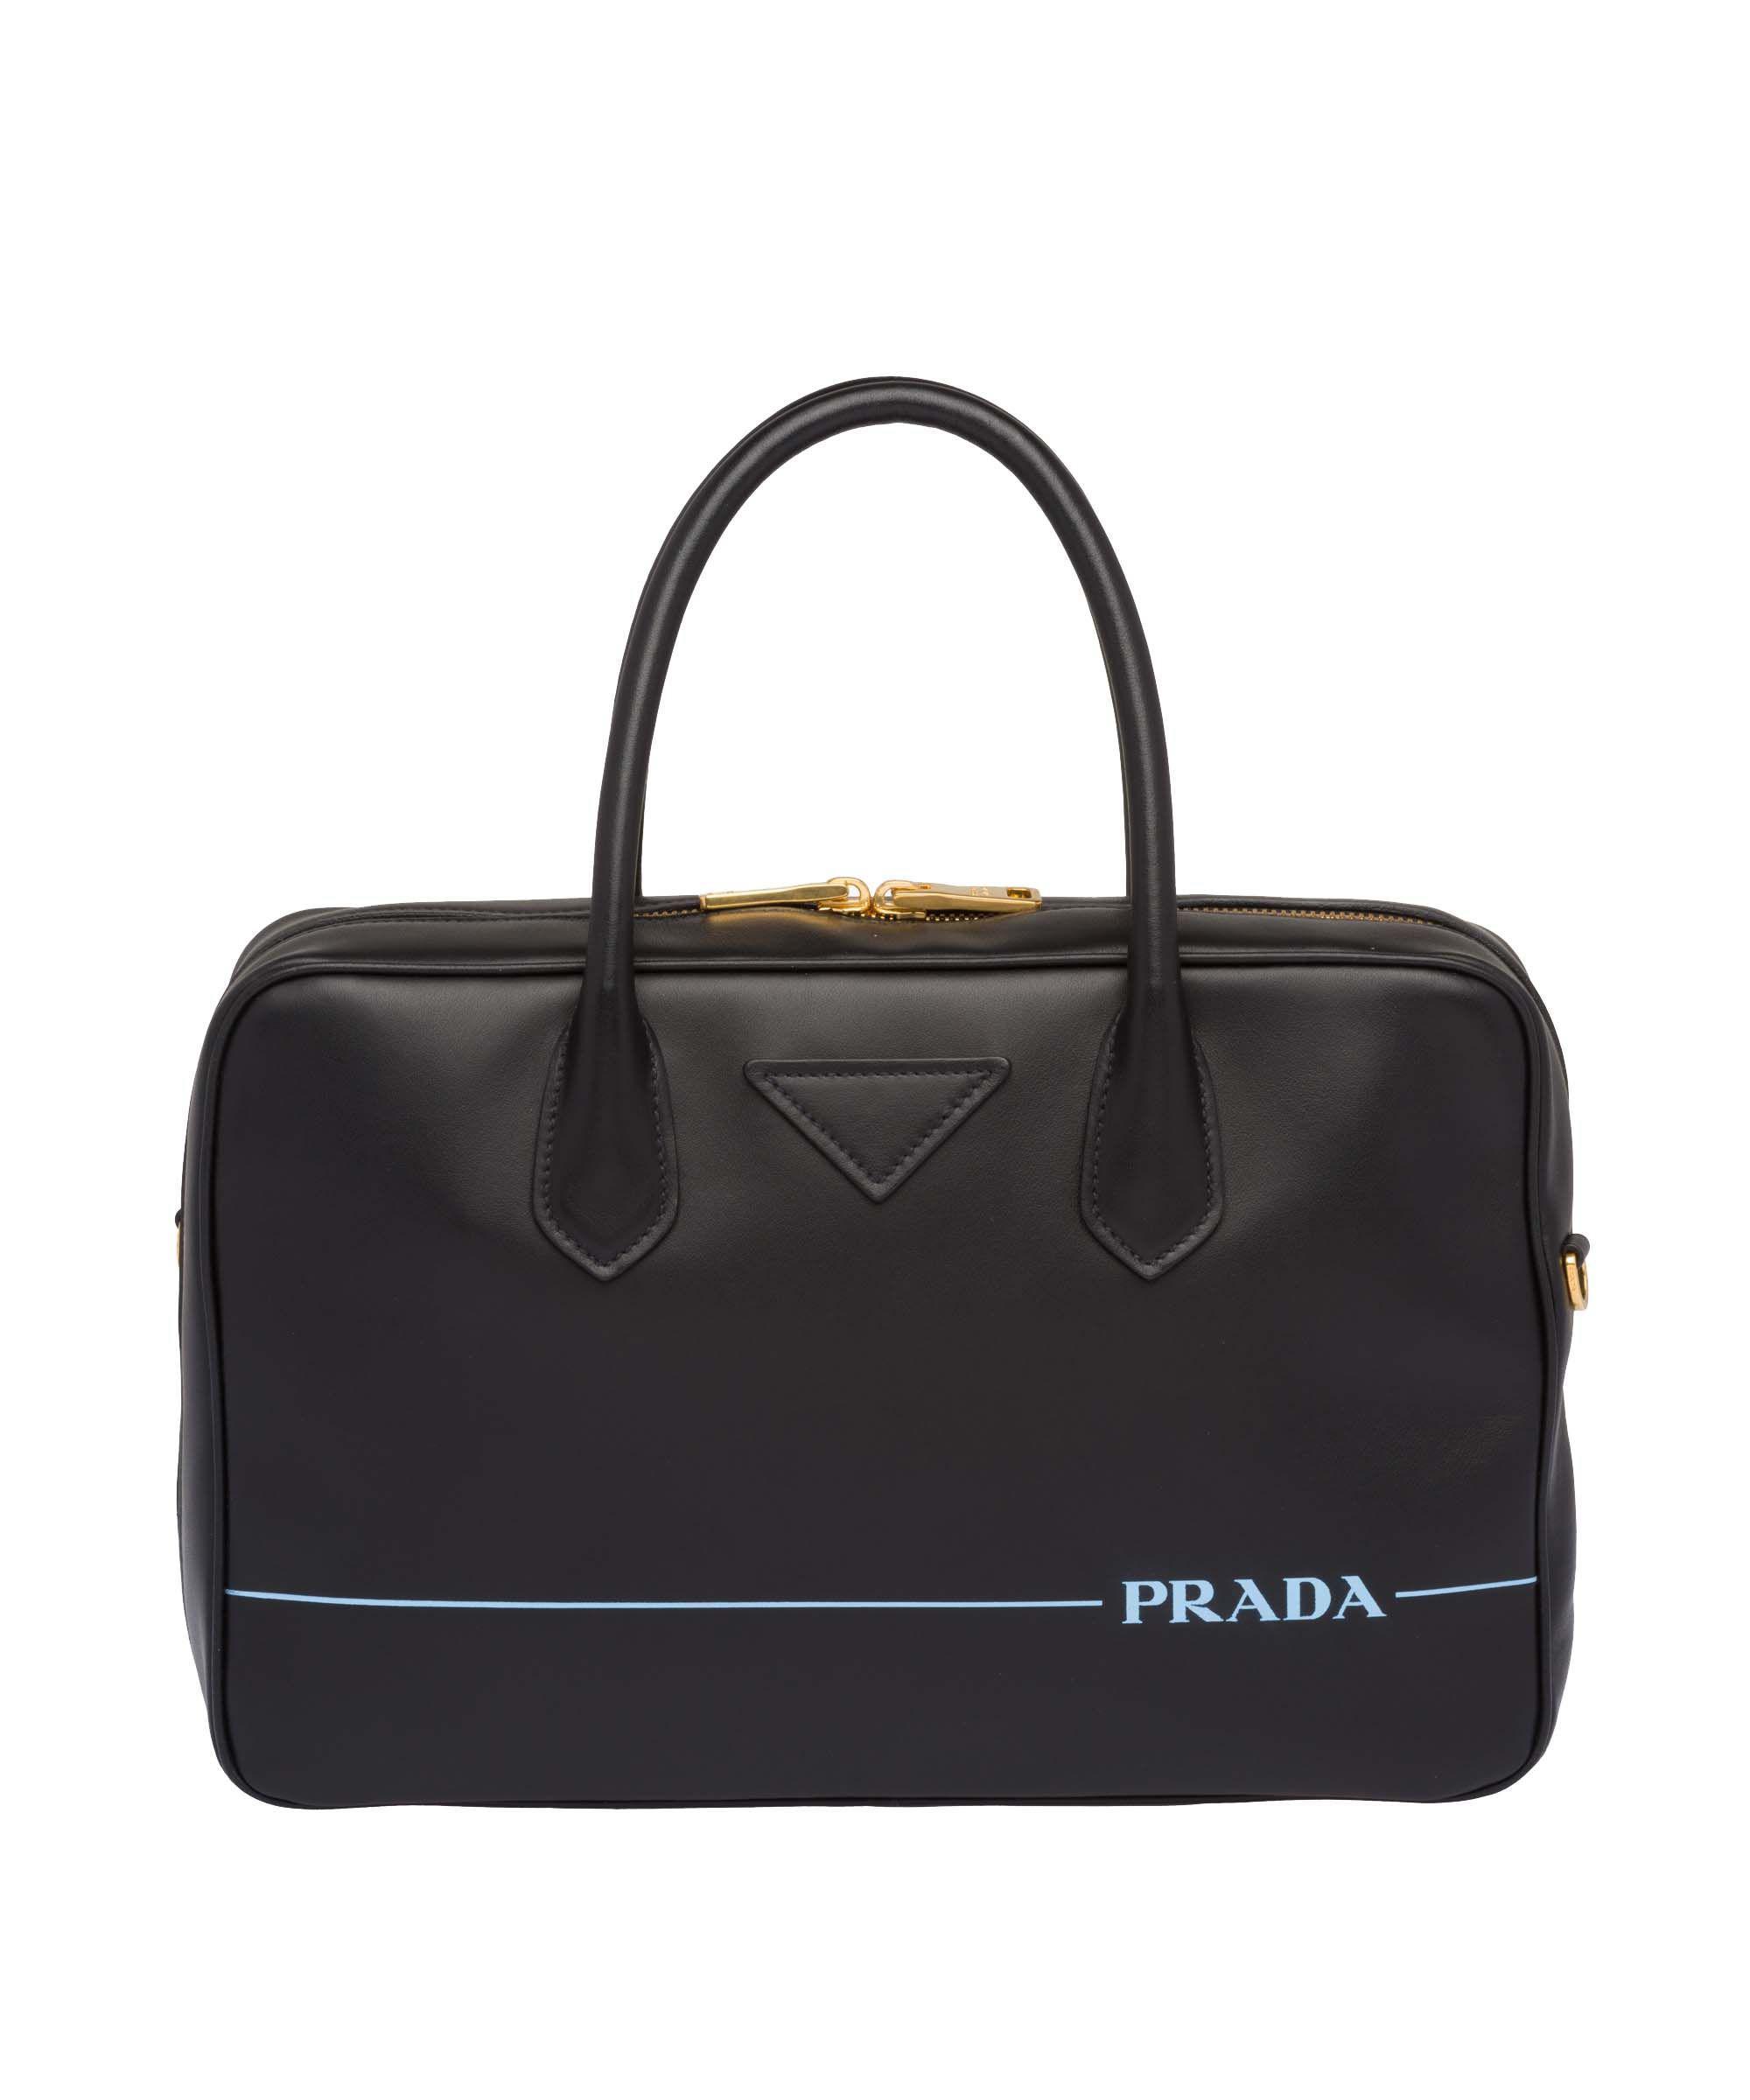 f26b91e345 Lyst - Prada Women s Black Leather Handbag in Black